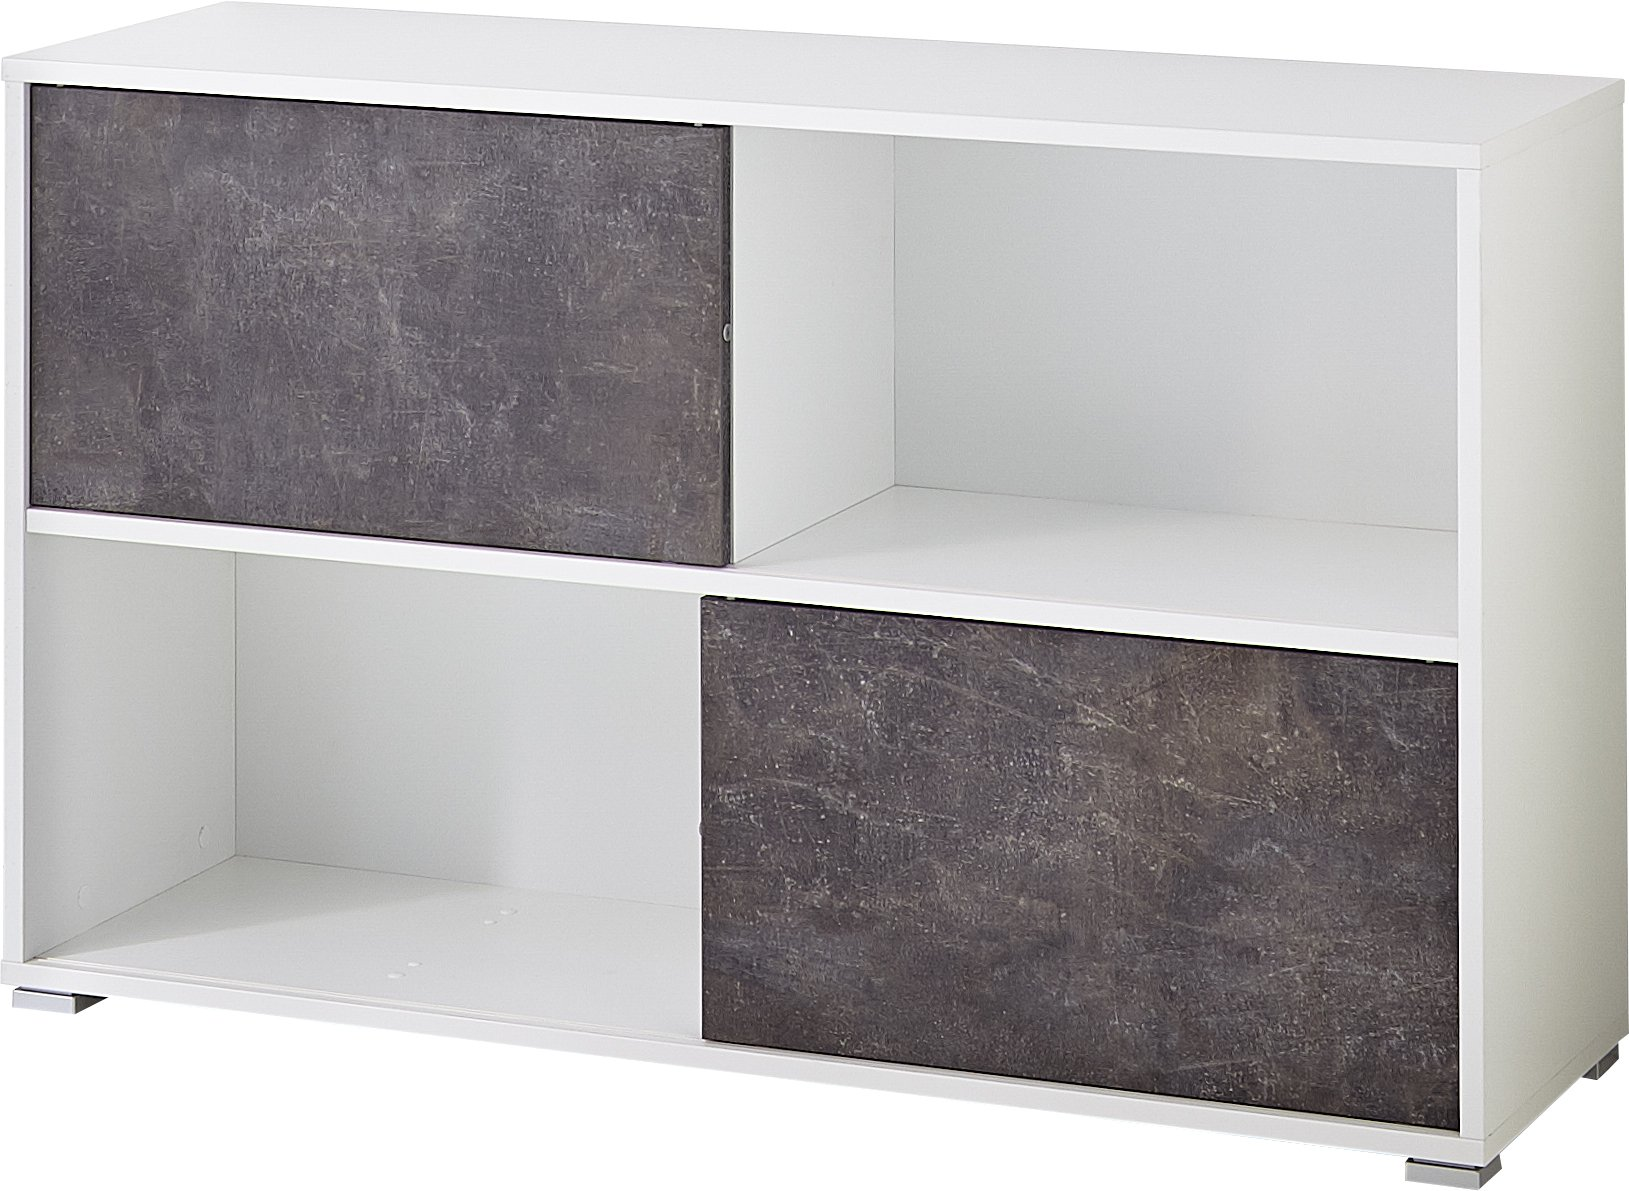 Germania 4152 – 261 GW de Altino Puerta Corredera Estantería, melamina Resina Revestido de aglomerado, Color Blanco/Oscuro de basalto, 35 x 120 x 74 cm: Amazon.es: Hogar